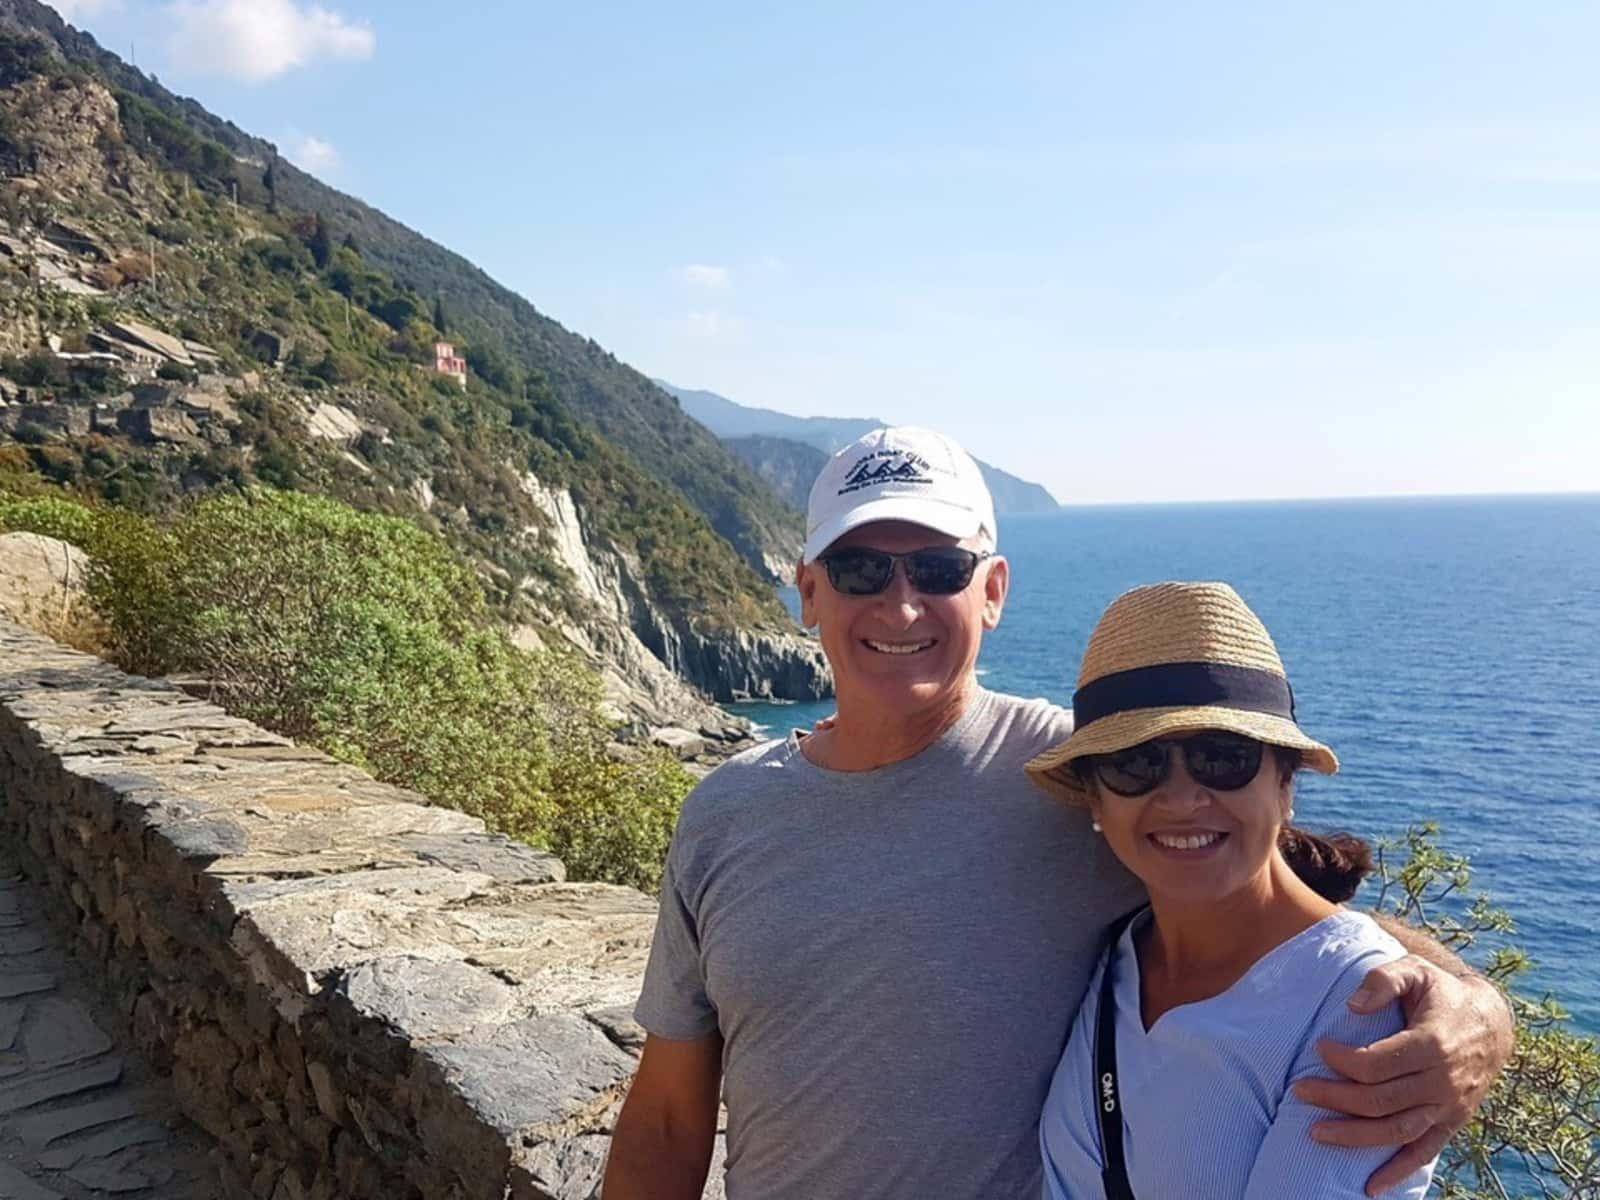 John & Katina from Noosaville, Queensland, Australia